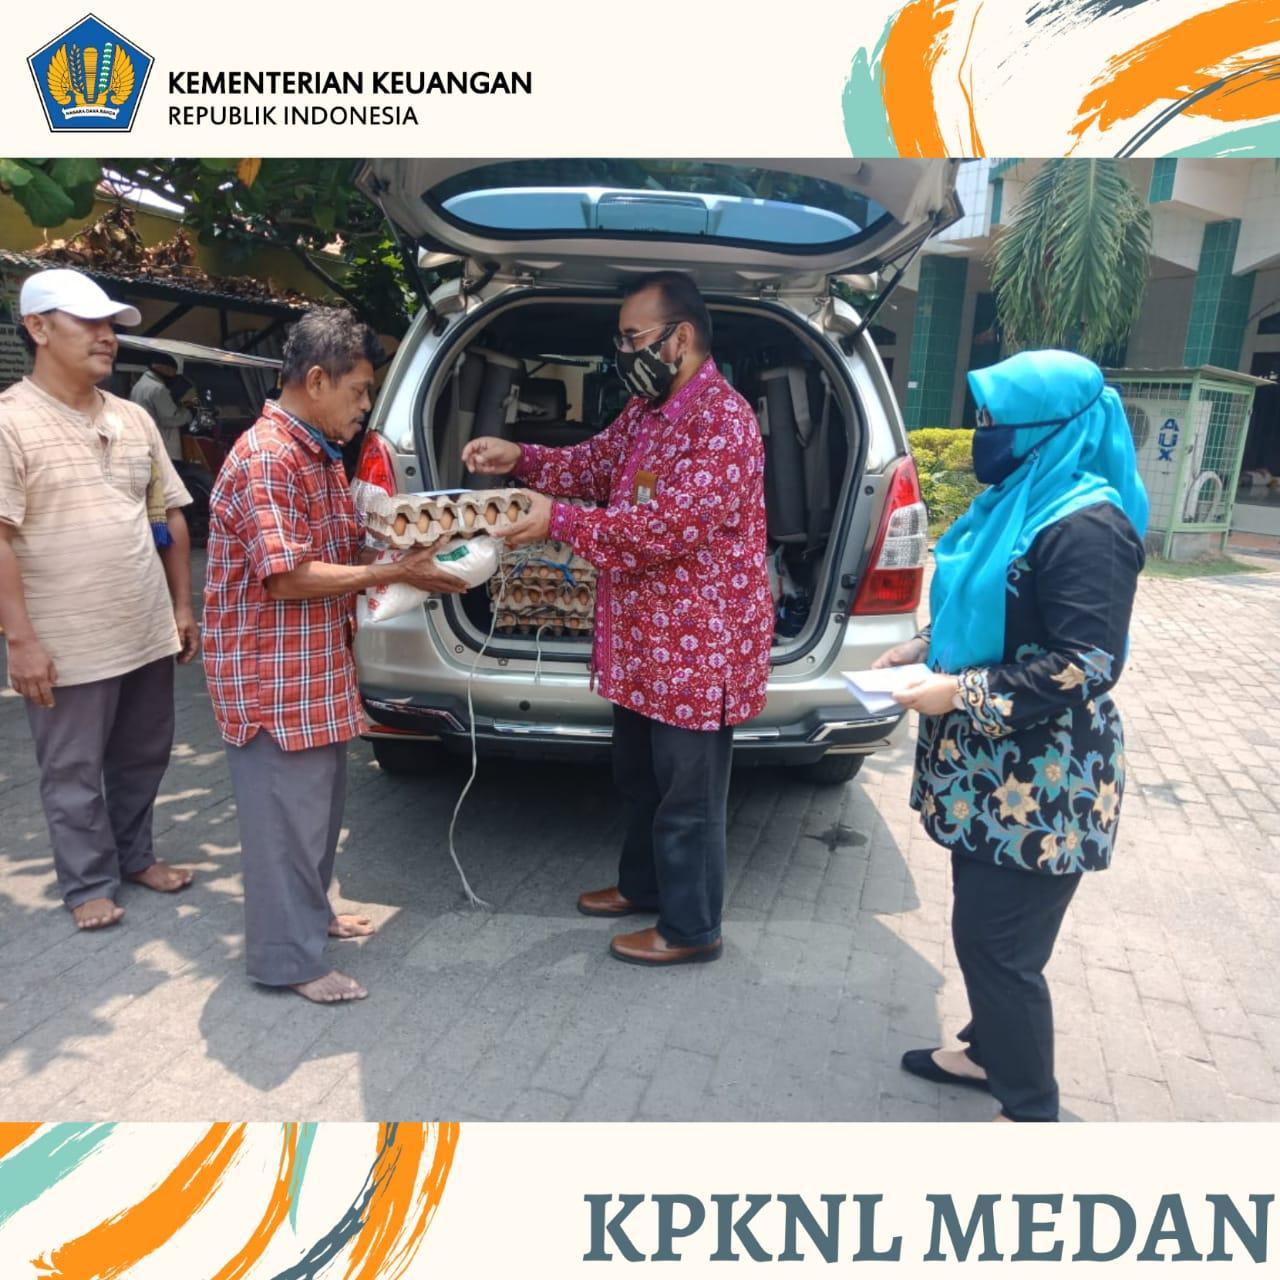 KPKNL Medan Peduli Dampak Covid-19